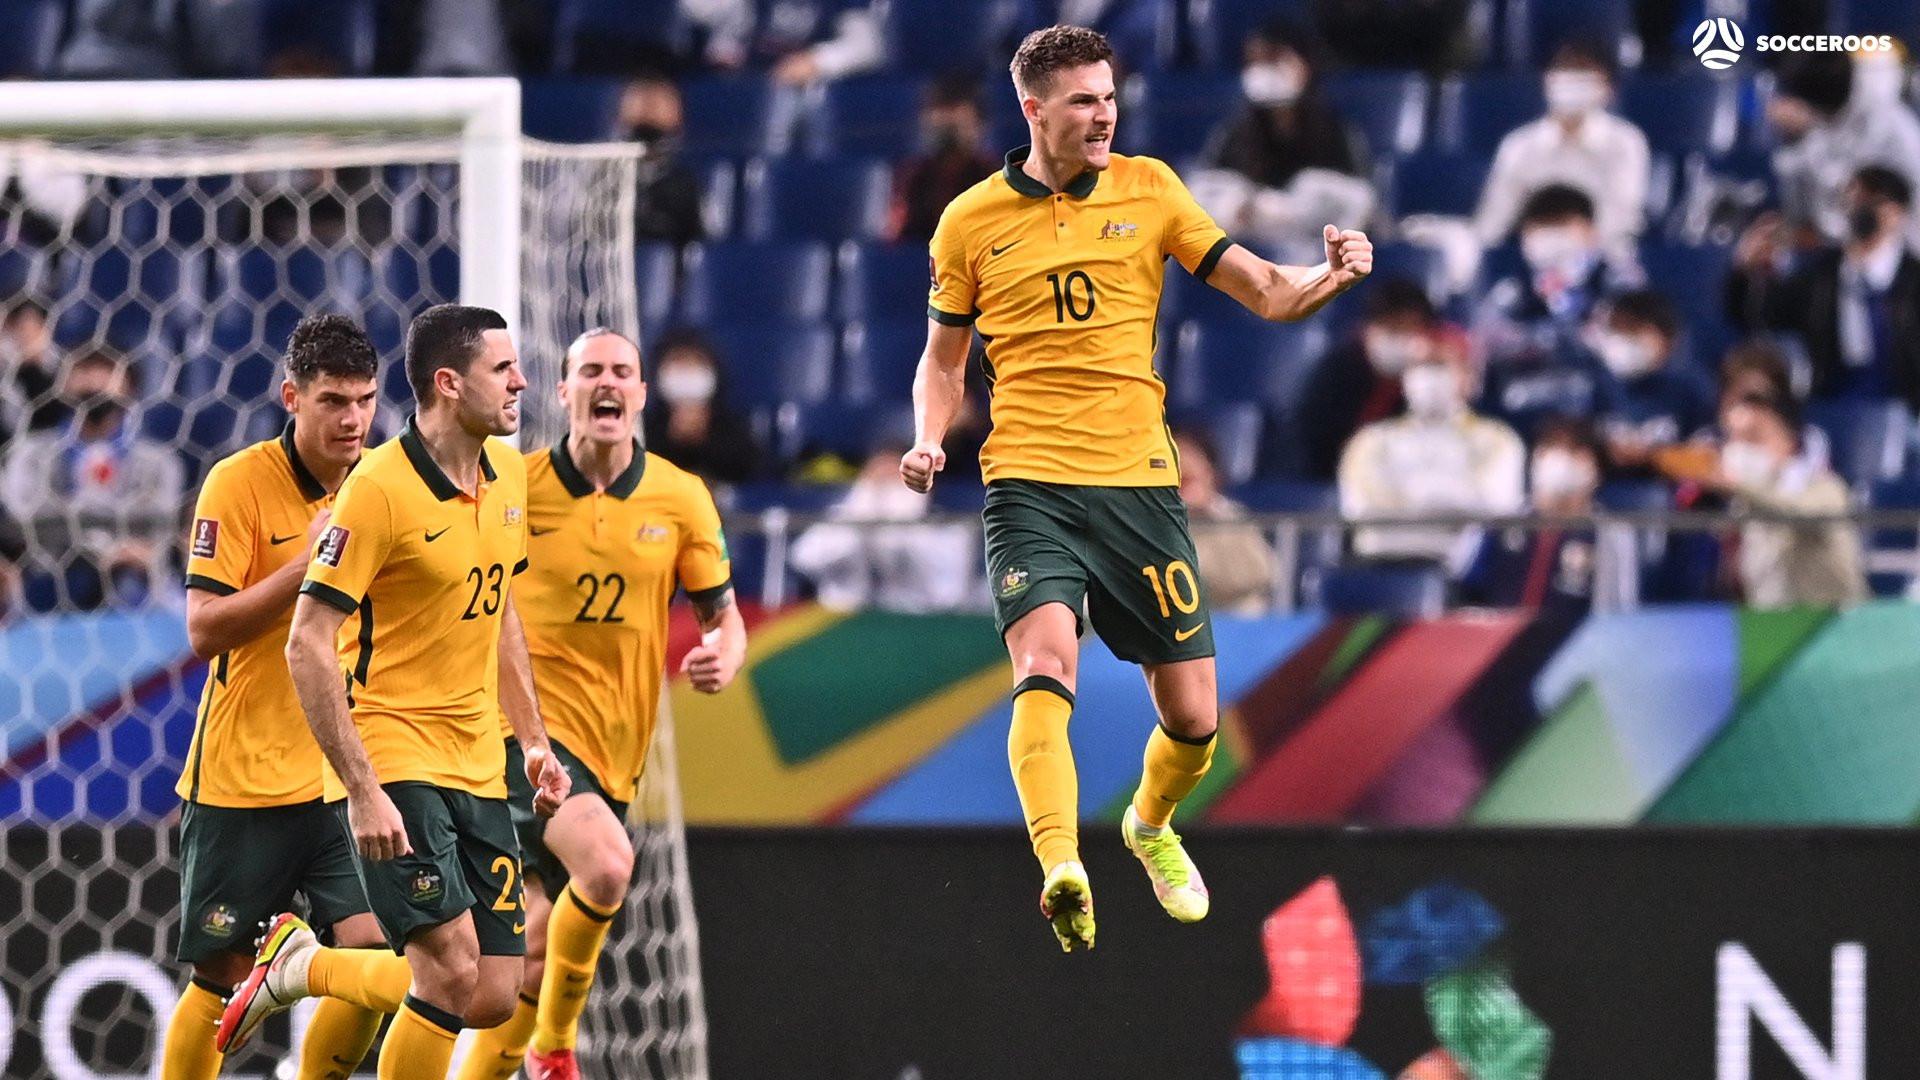 Australia Bawa 21 Pemain untuk Menantang Indonesia U-23, 7 Pilar Berkarier di Luar Negeri - JPNN.com